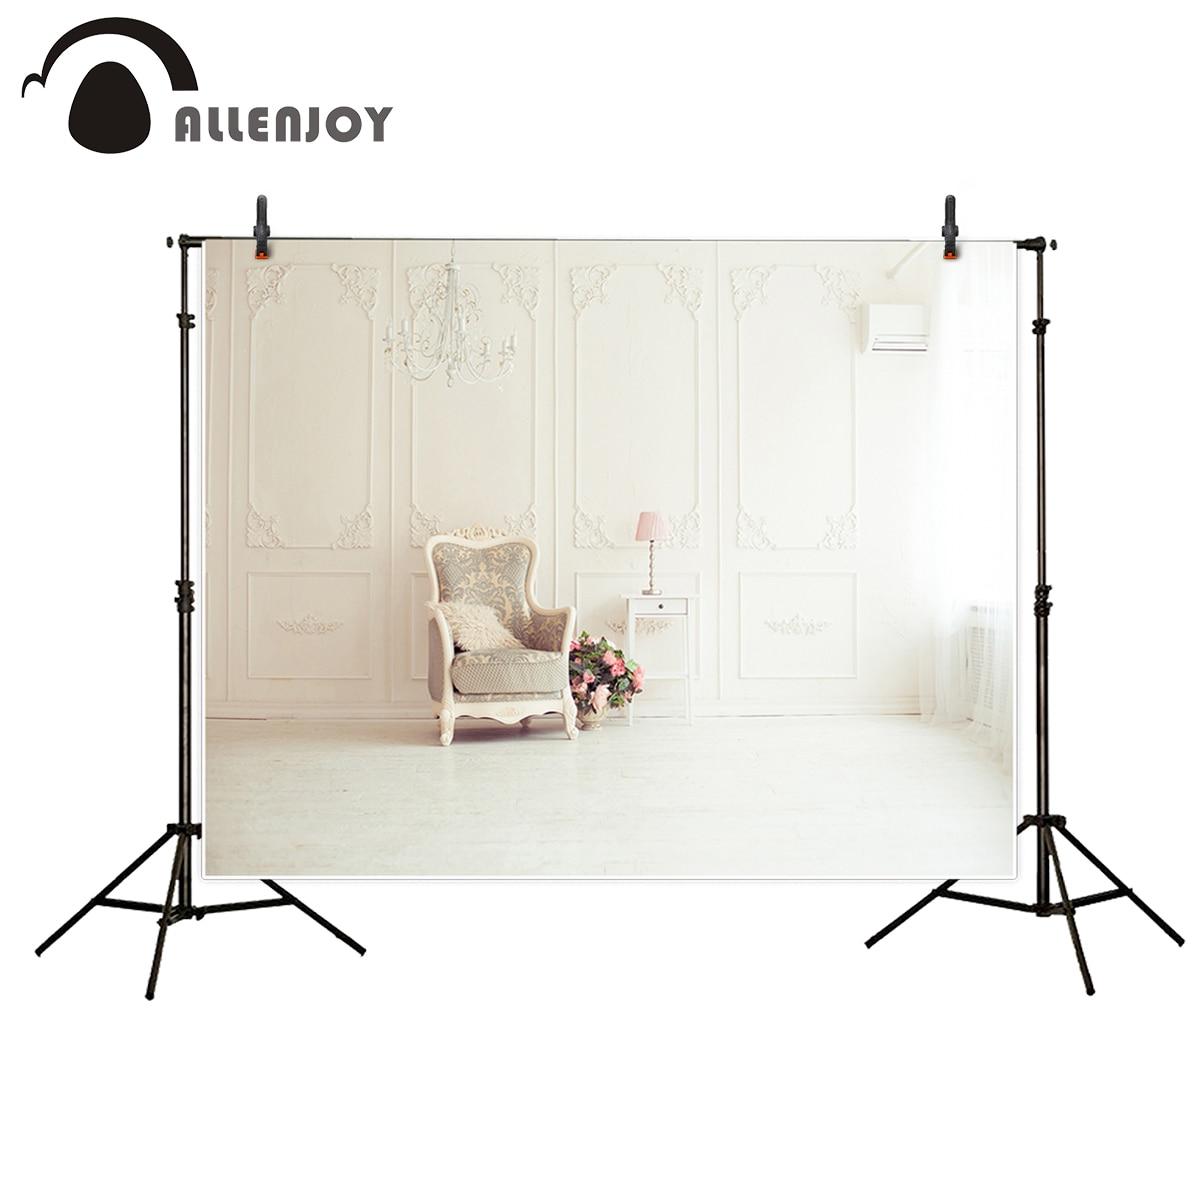 Allenjoy fotografía telón de fondo estilo europeo pared interior romántica boda silla luz Fondo cámara de estudio fotográfico fotográfica